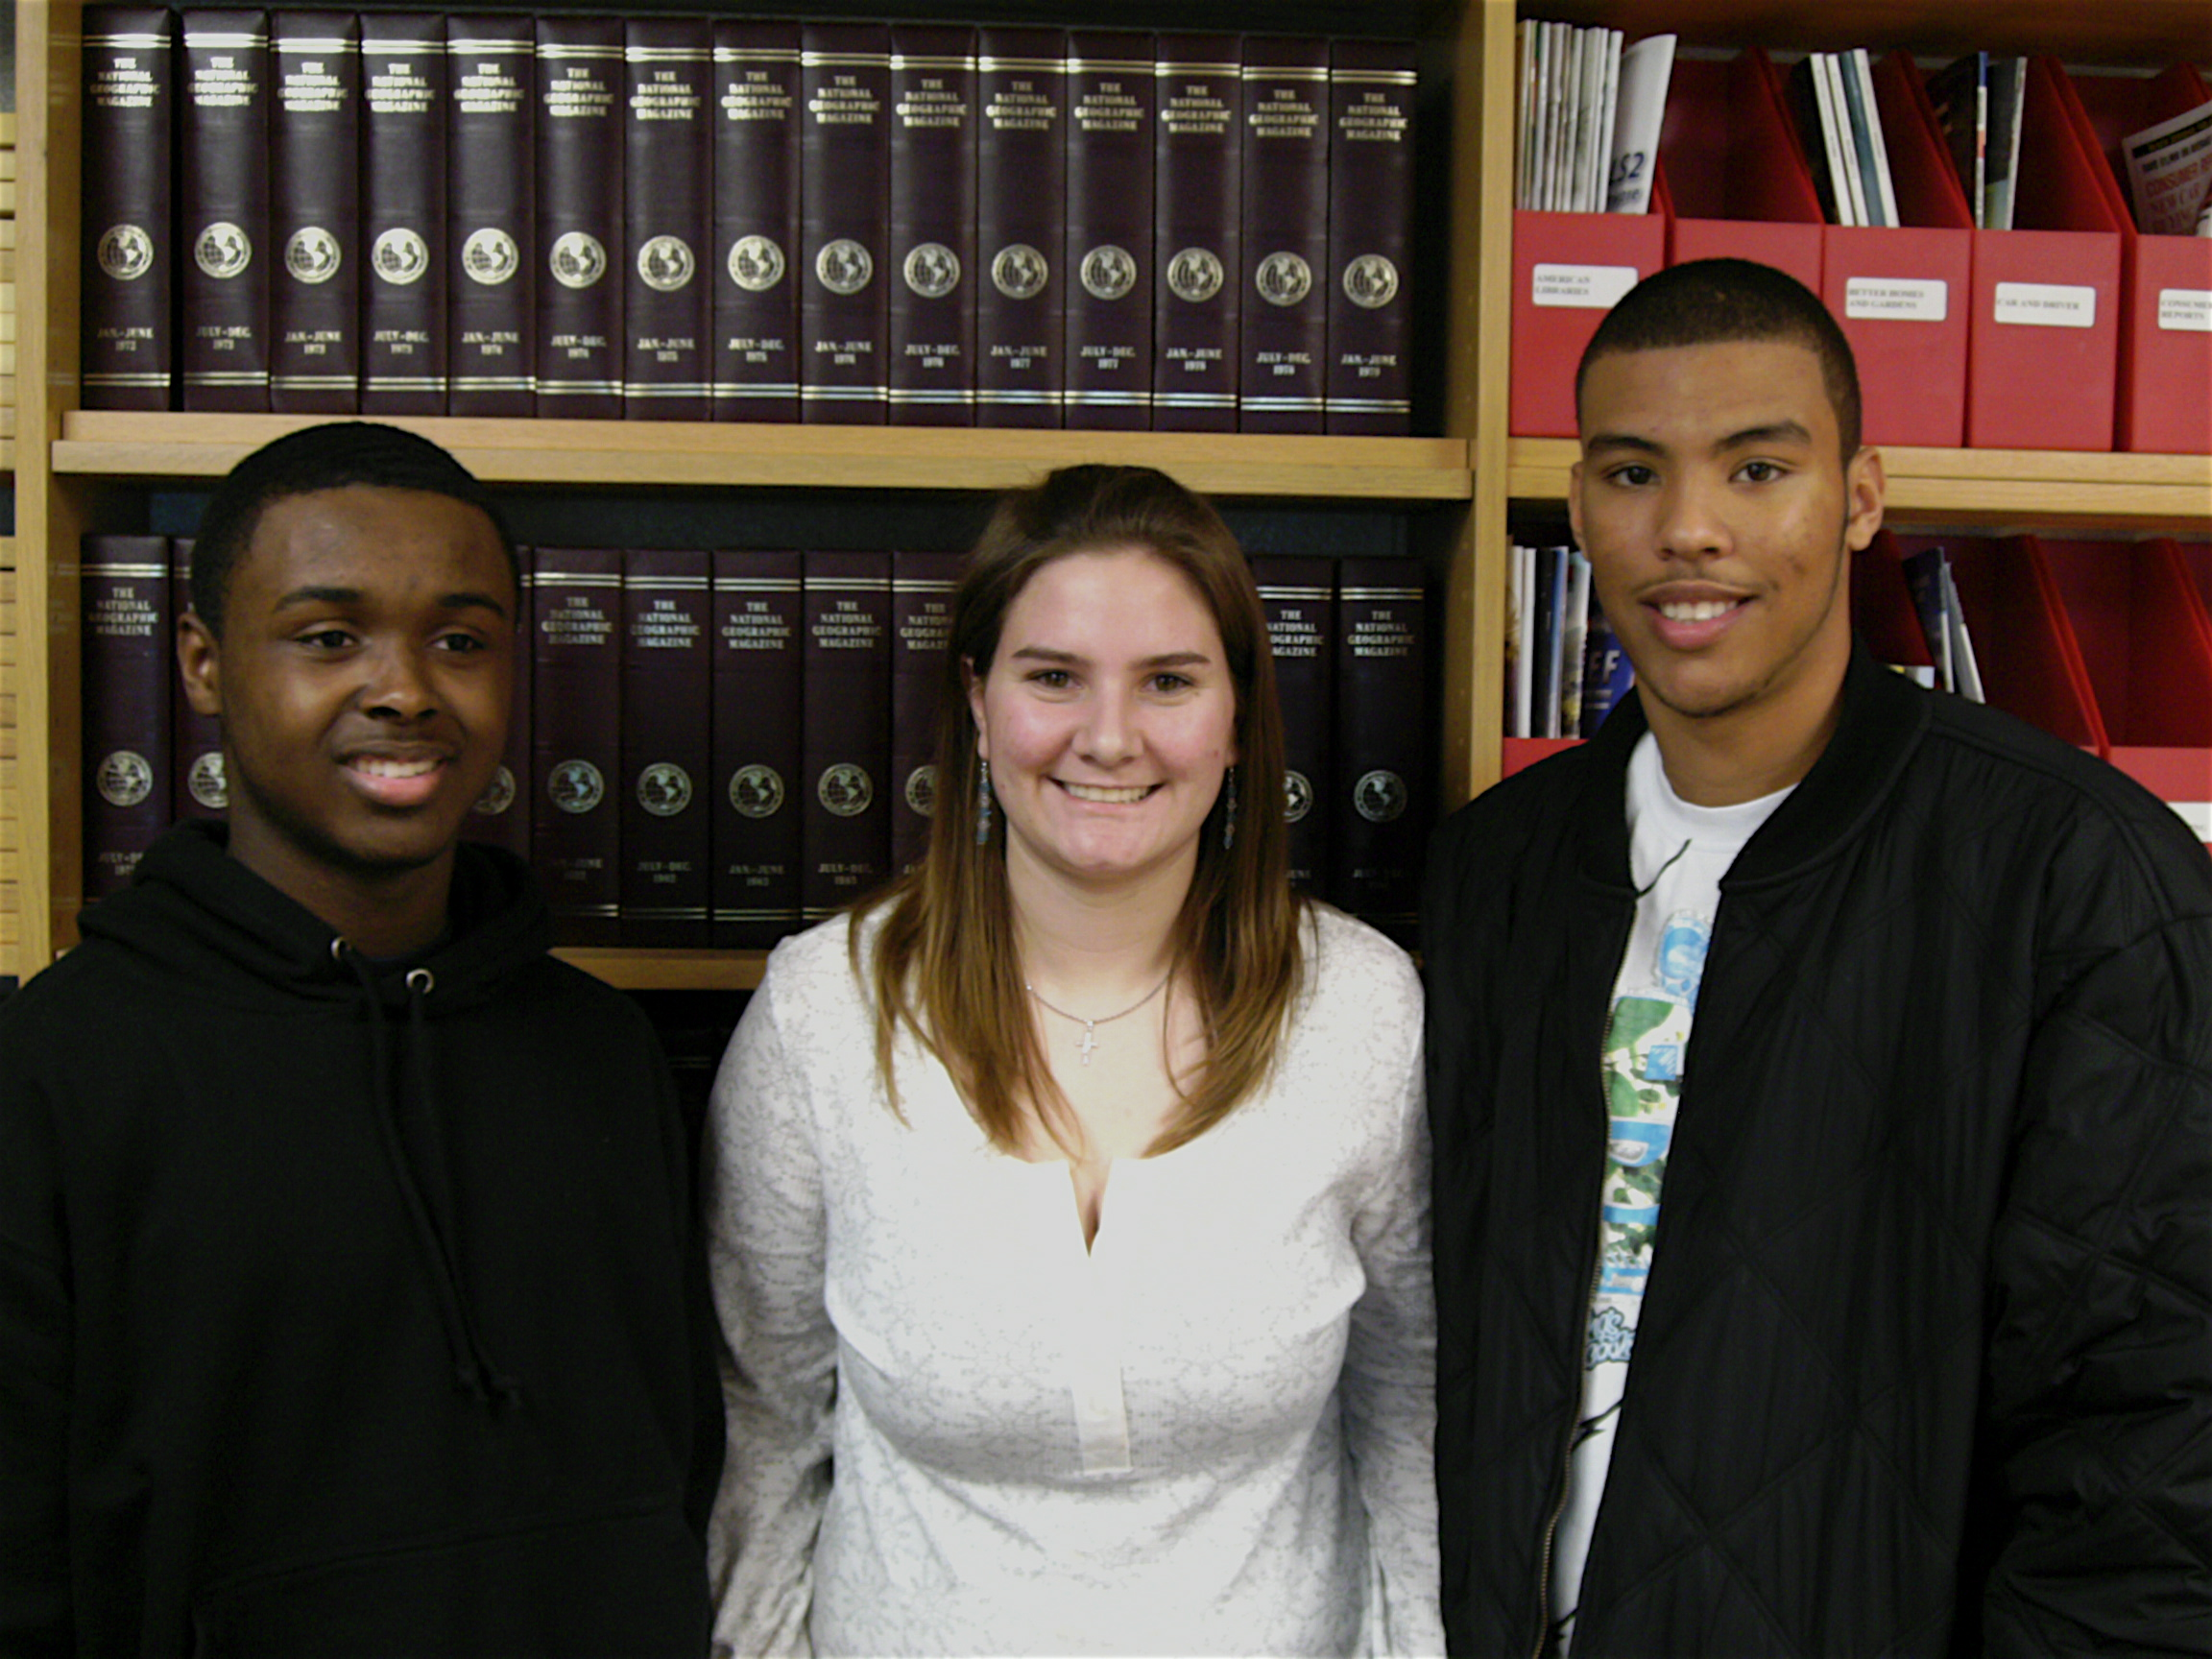 Timothy Wisdom,Christina Bechardl, Michael Oliver